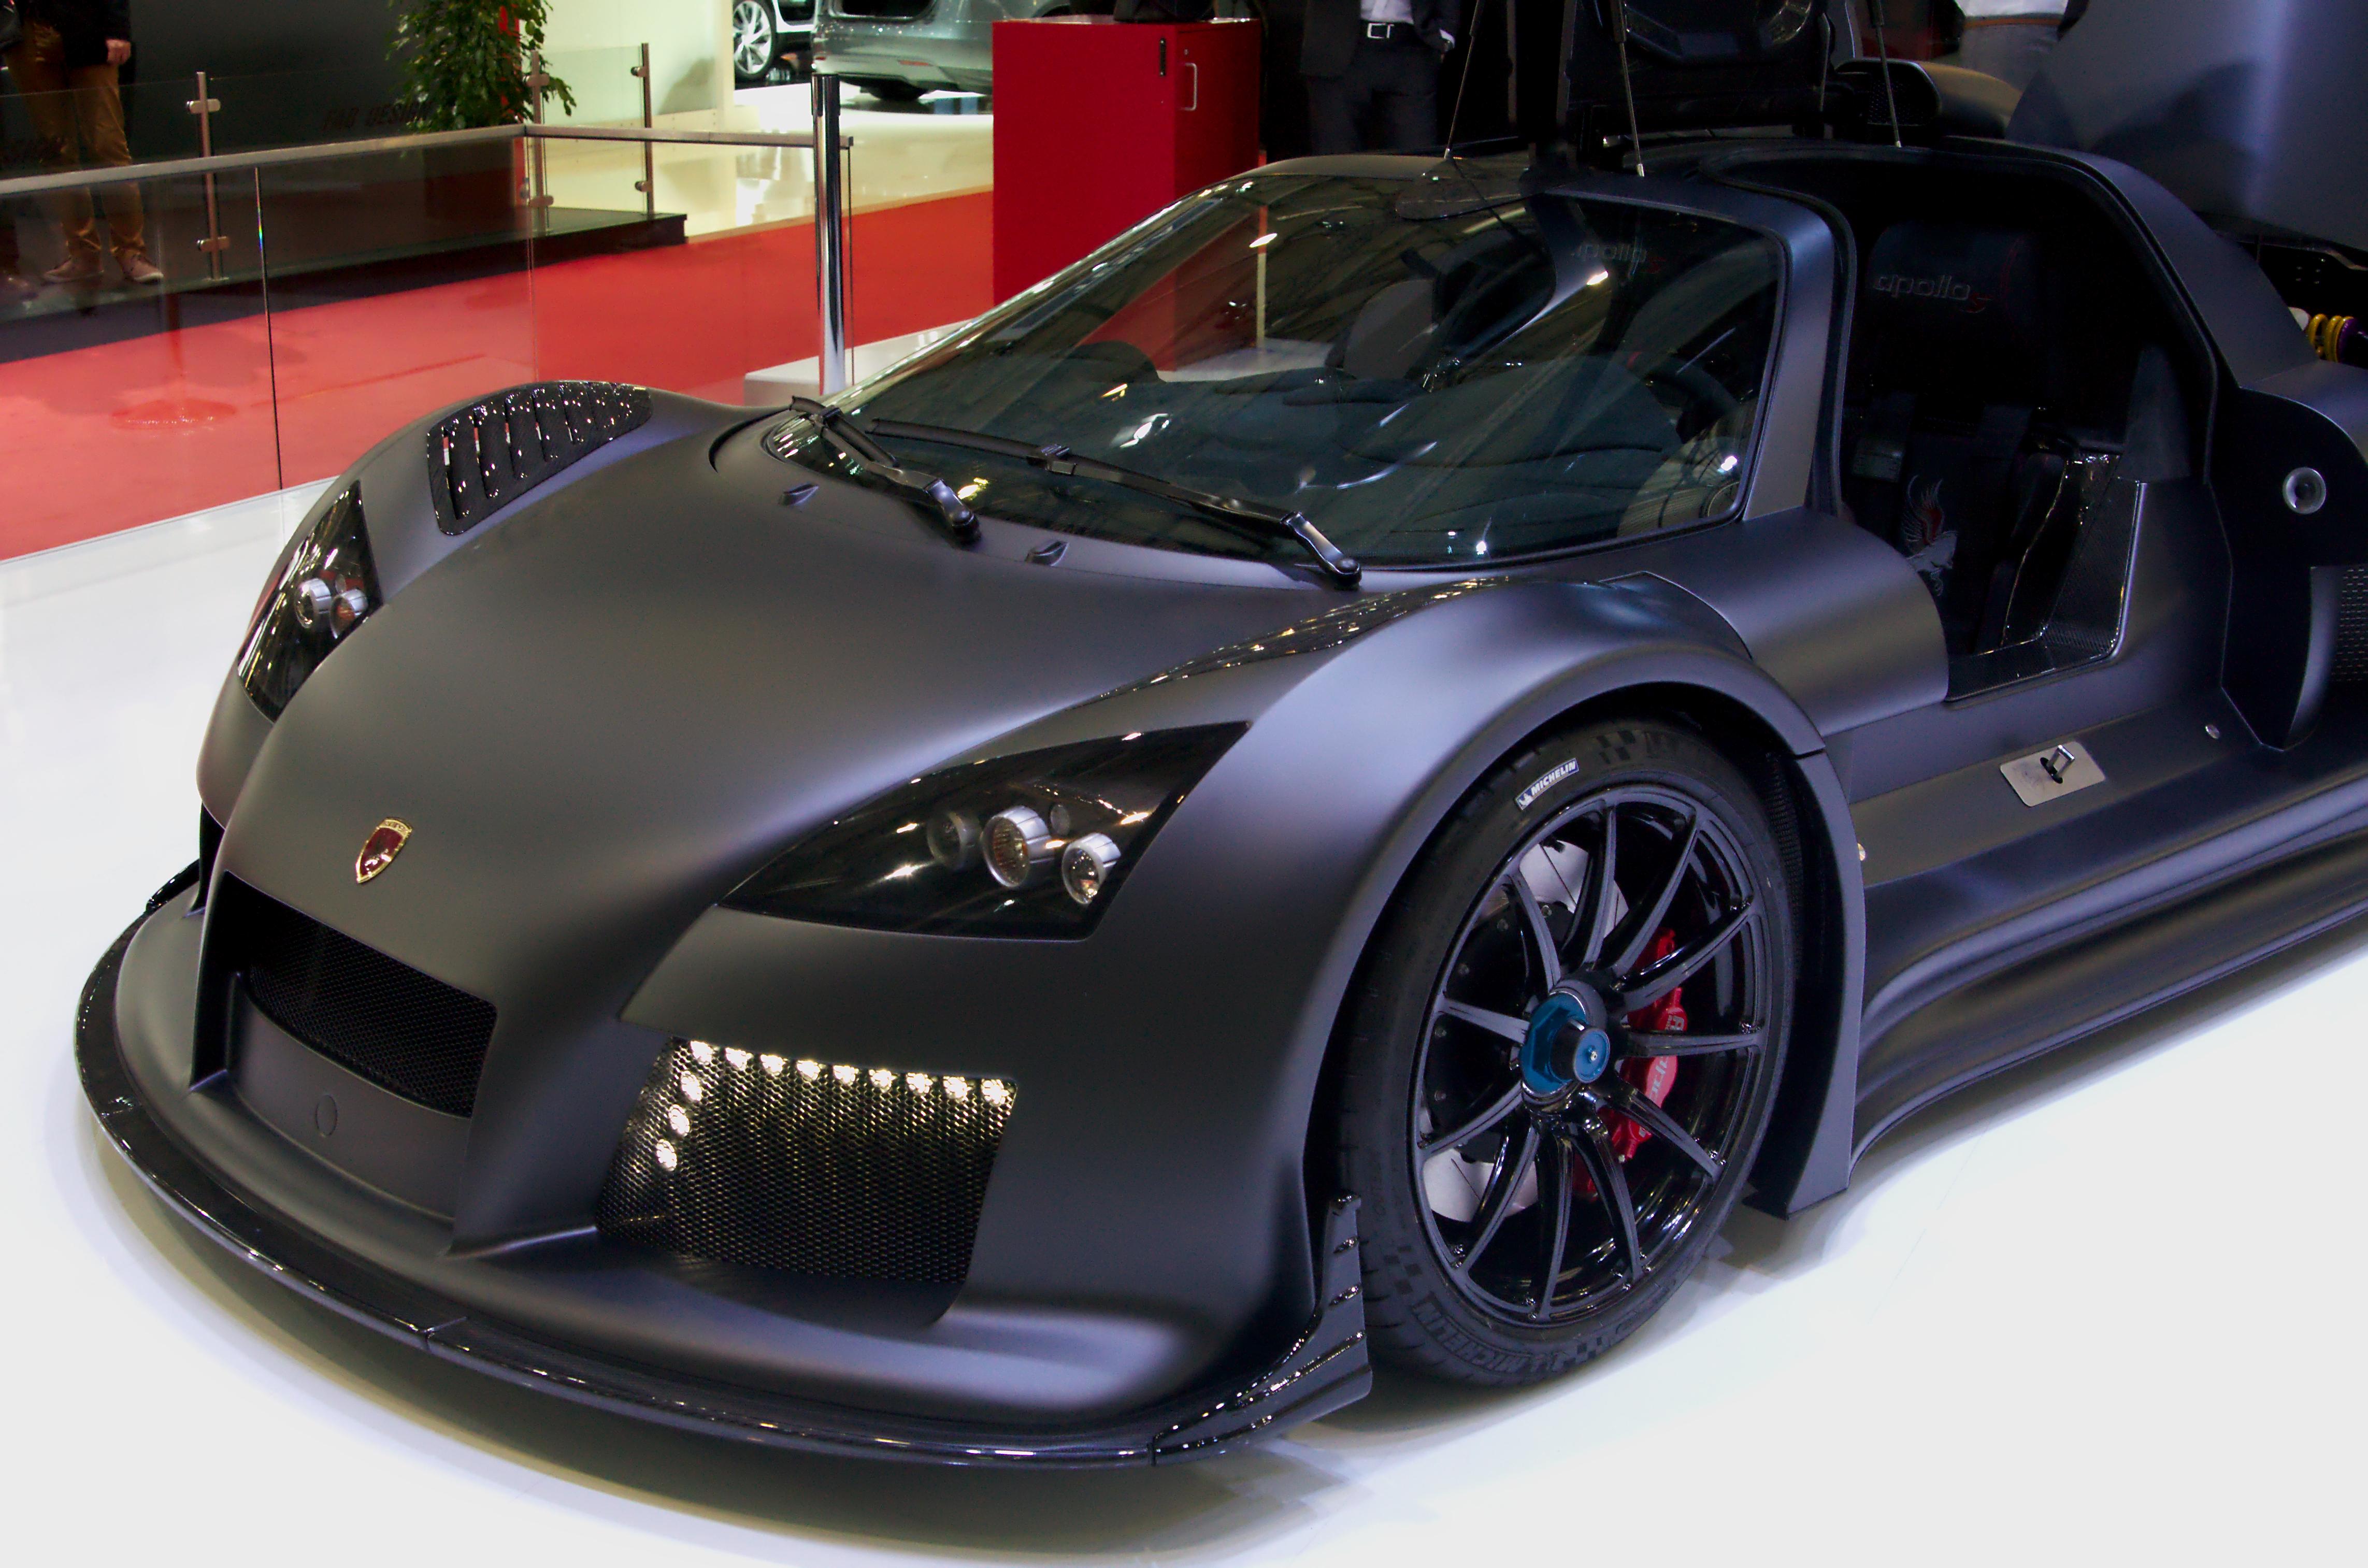 File:Geneva MotorShow 2013 - Gumpert Apollo S black front.jpg ...